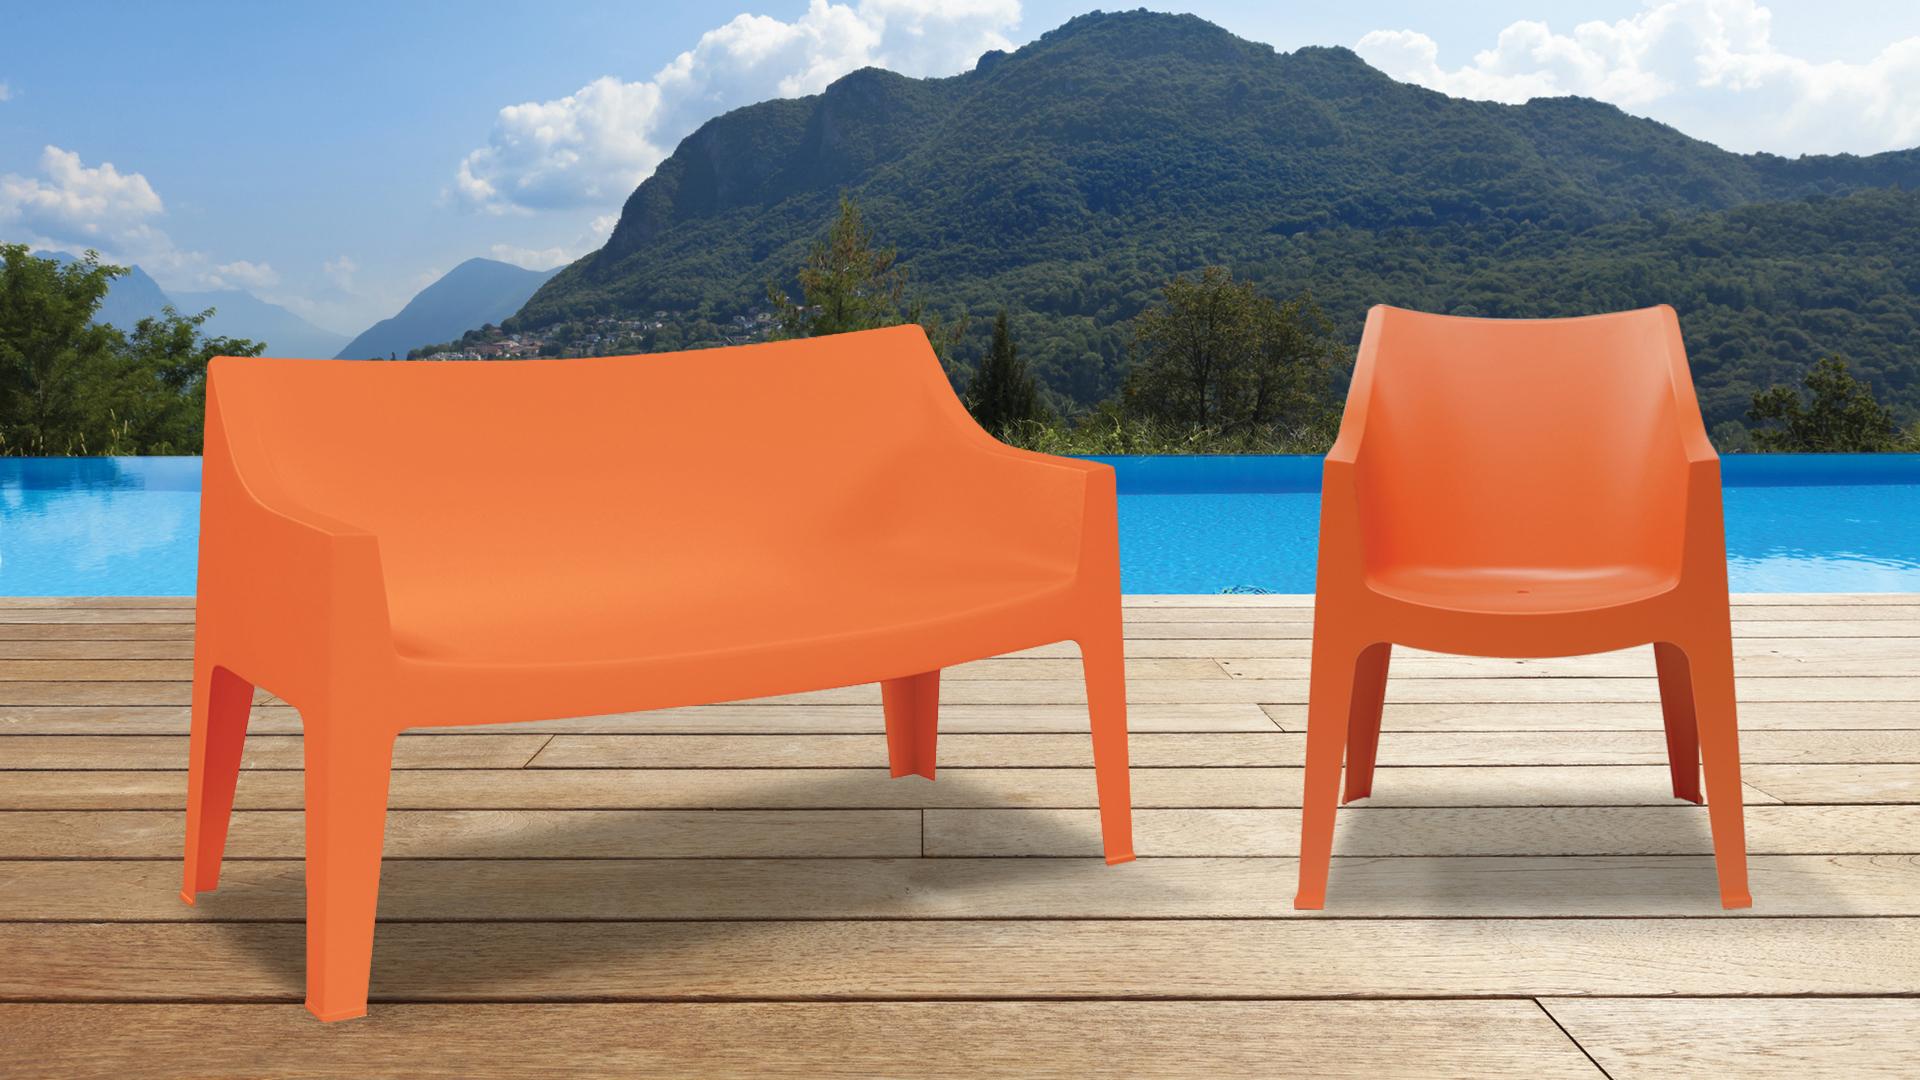 mobiliers de jardin le blog du design ext rieur mobiliers de d corationmobiliers de jardin. Black Bedroom Furniture Sets. Home Design Ideas